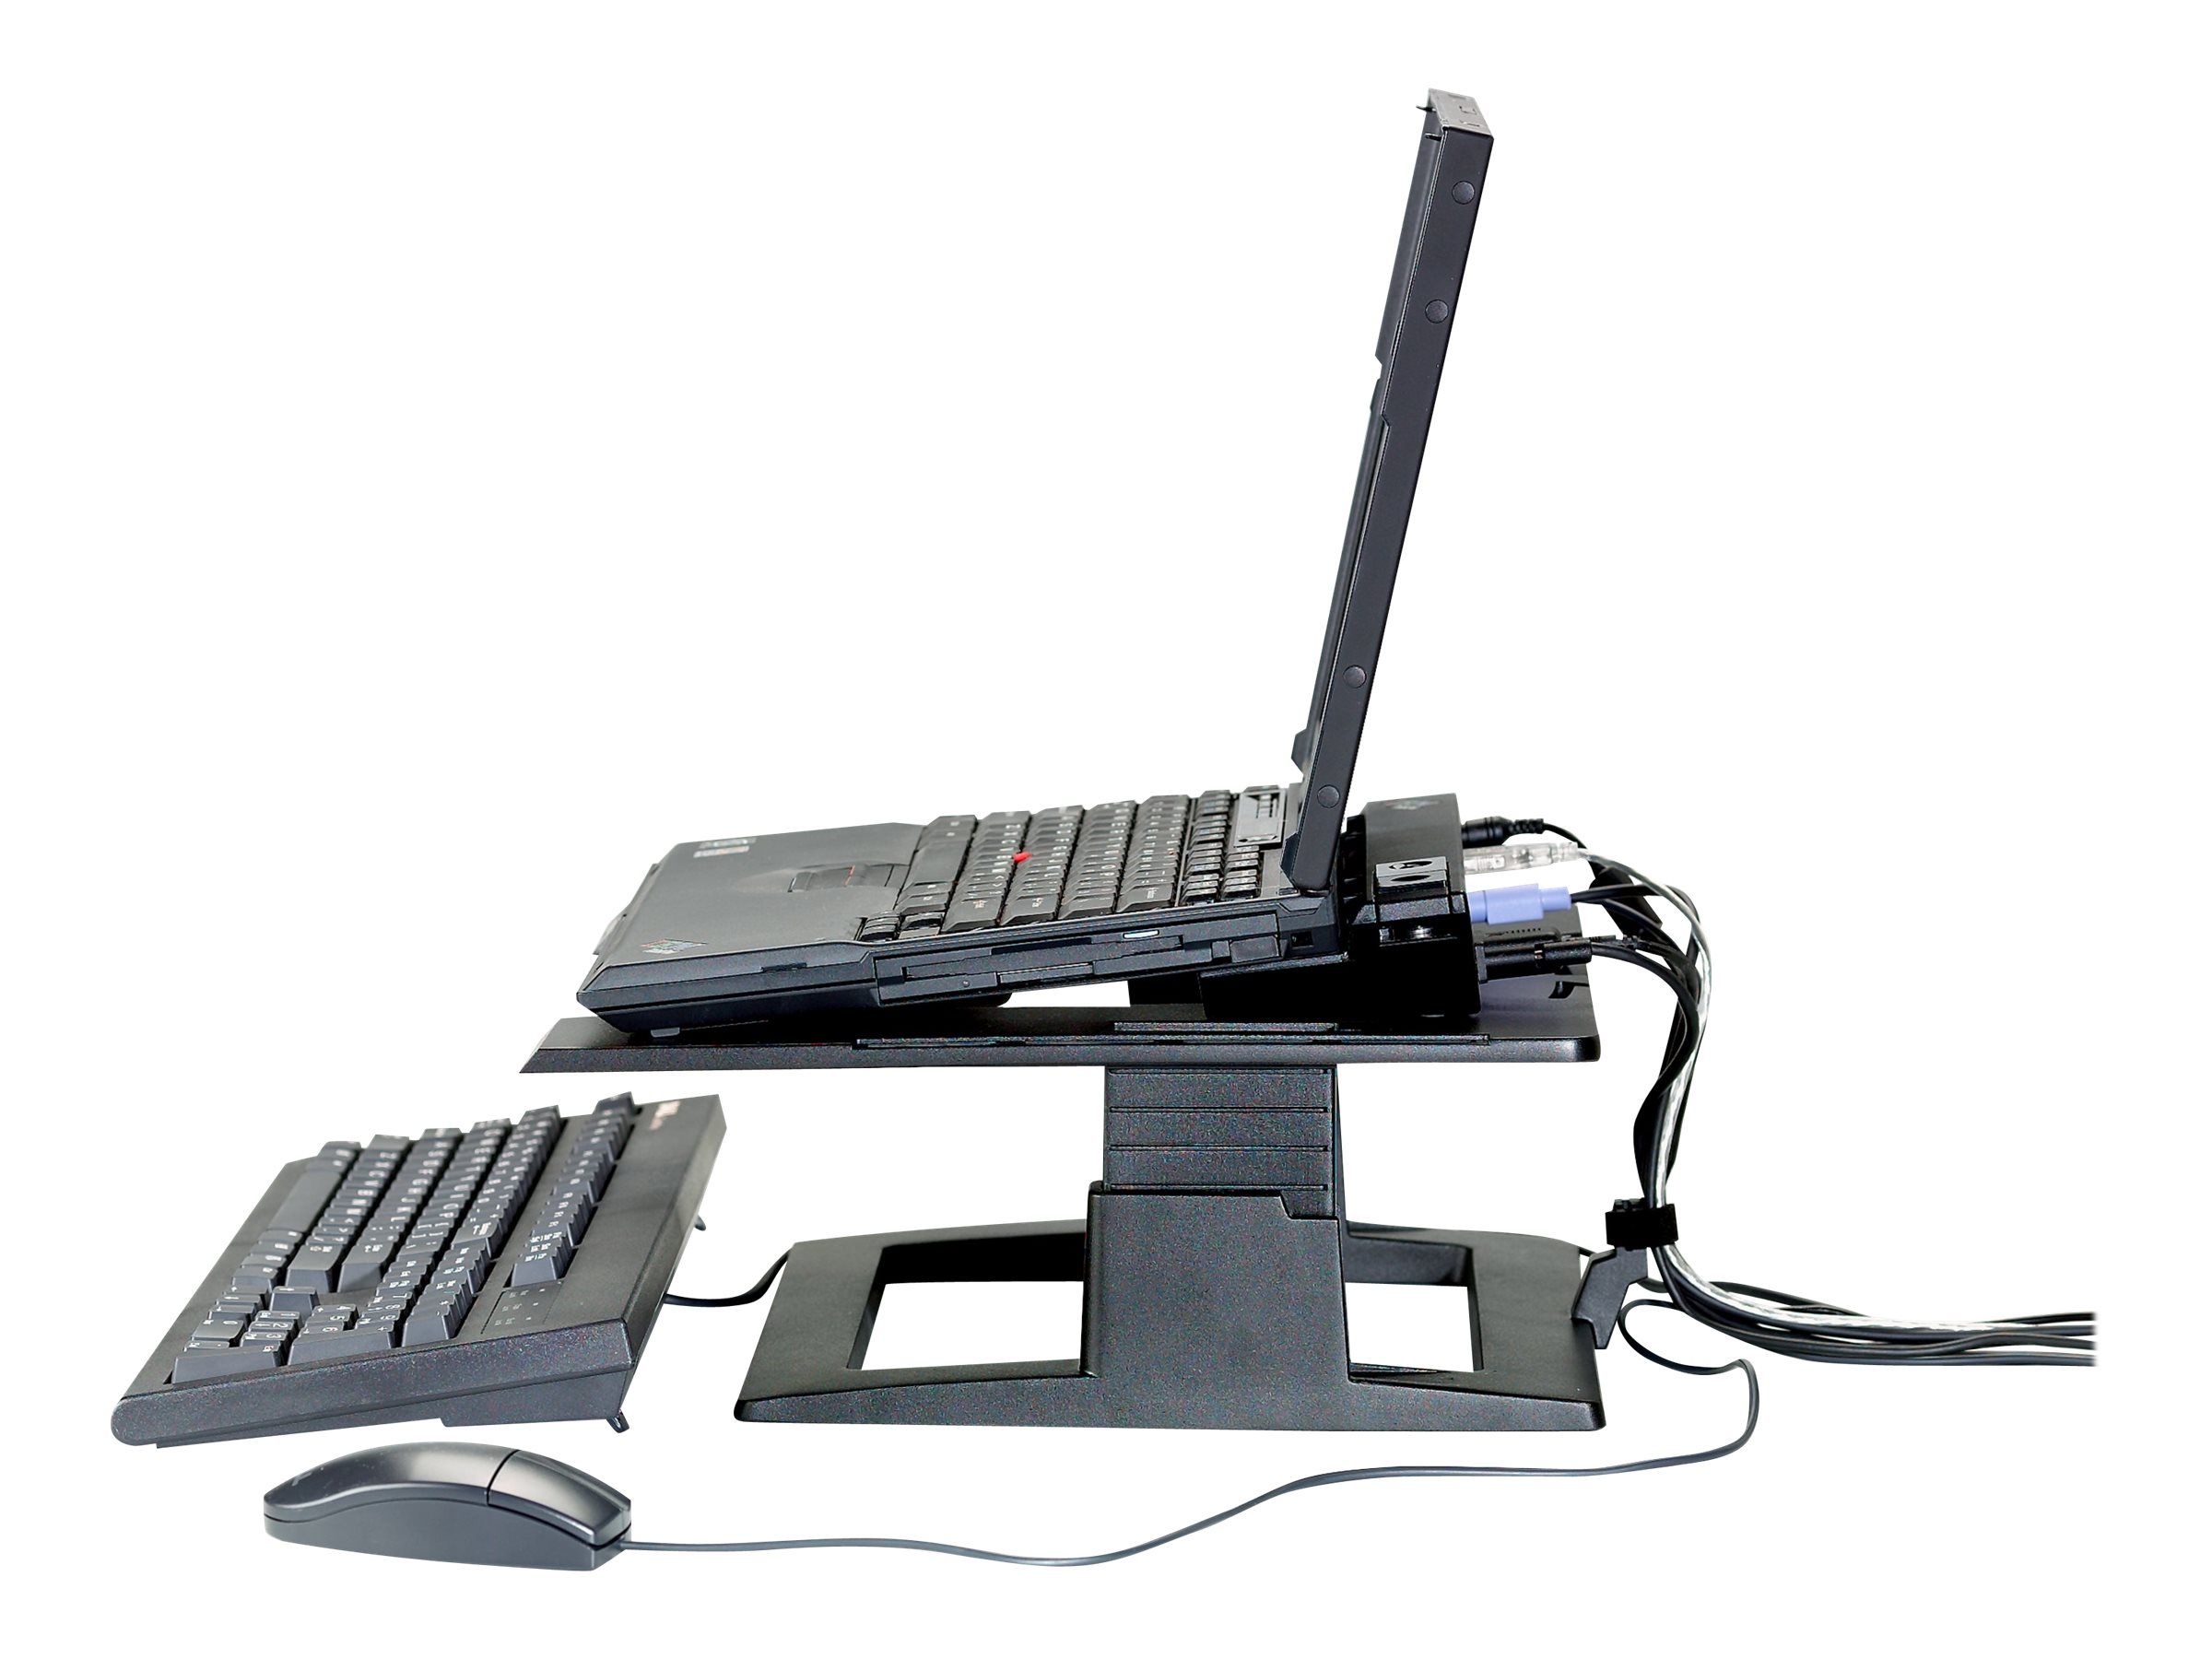 3M Adjustable Notebook Riser LX500 notebook platform